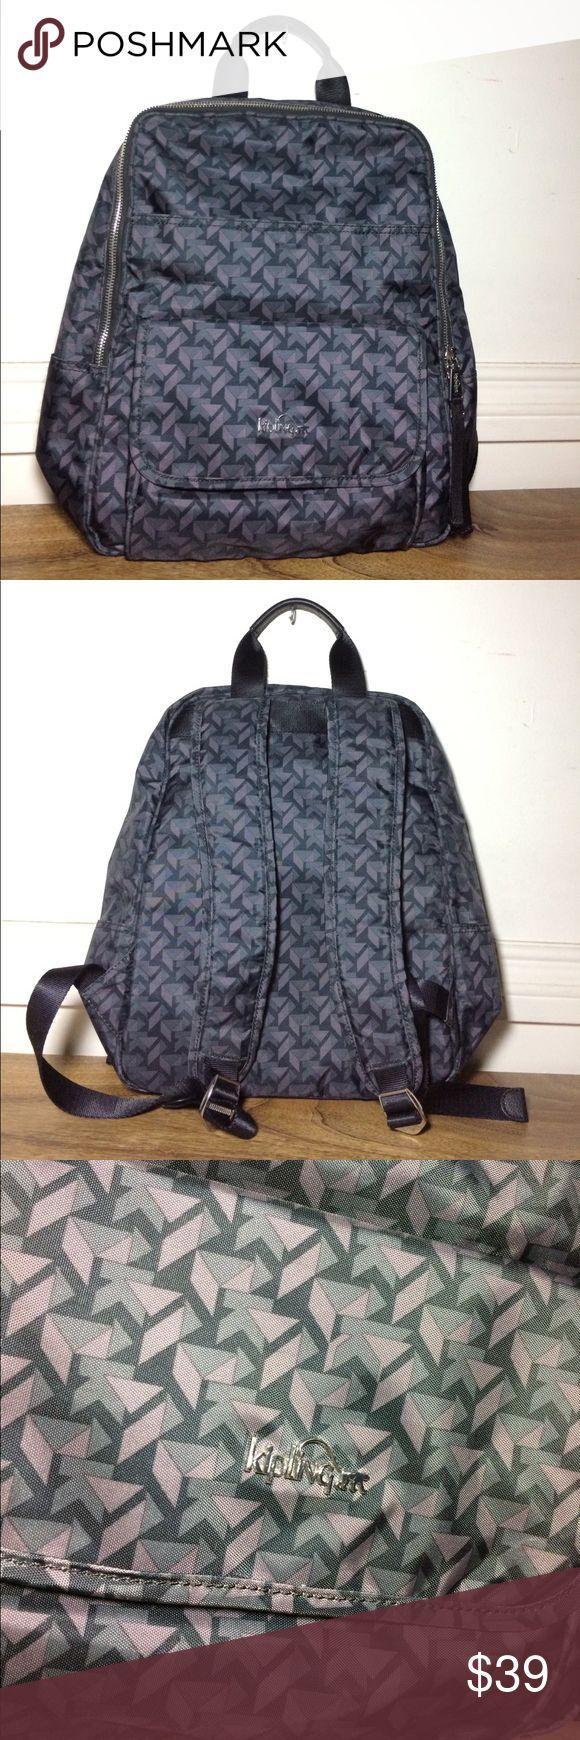 25 best ideas about kipling backpack on pinterest school handbags - Kipling Backpack